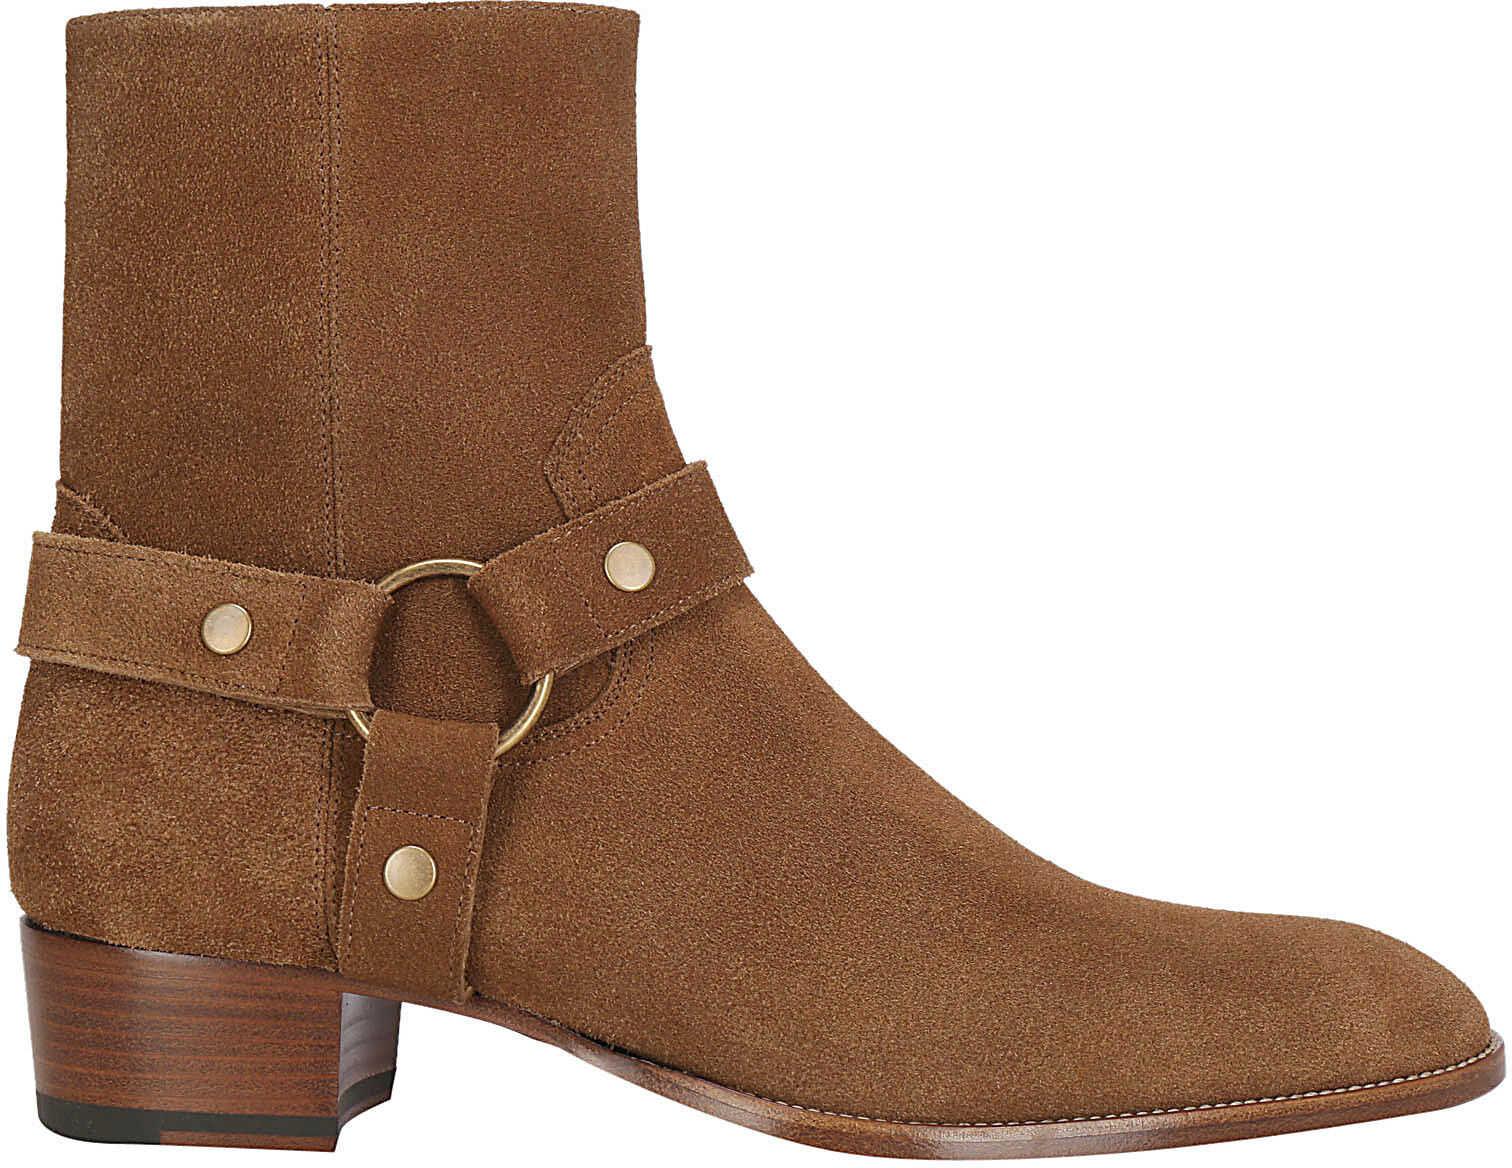 Saint Laurent Boots 443190BPN00 N/A imagine b-mall.ro